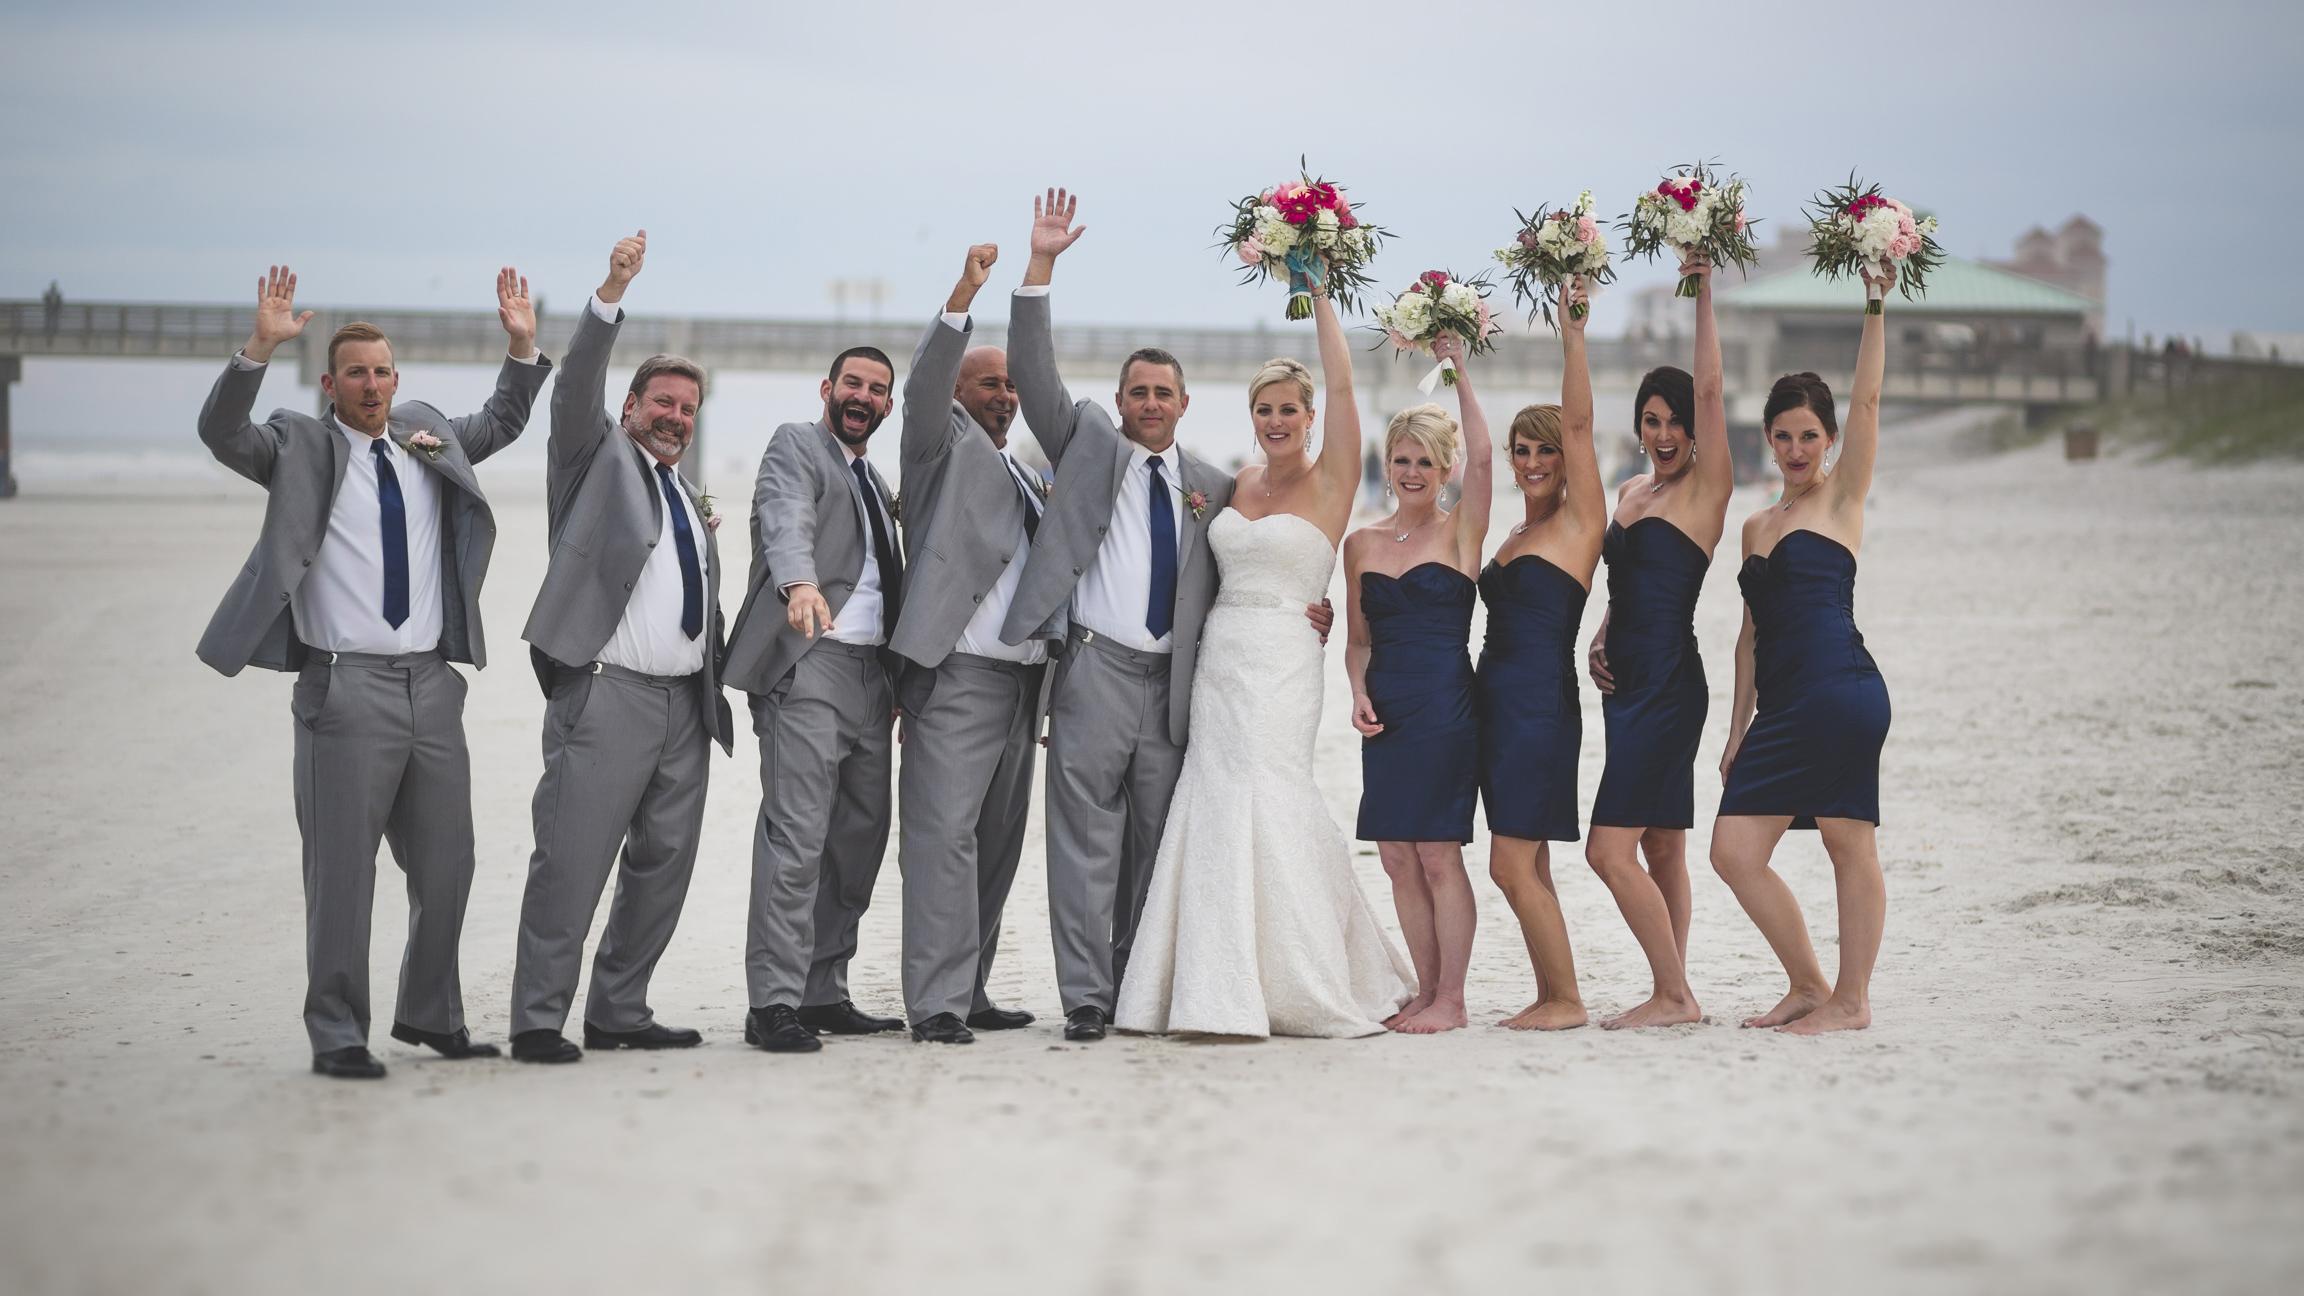 adam-szarmack-casa-marina-wedding-photographer-jacksonville-beach-florida-38.jpg